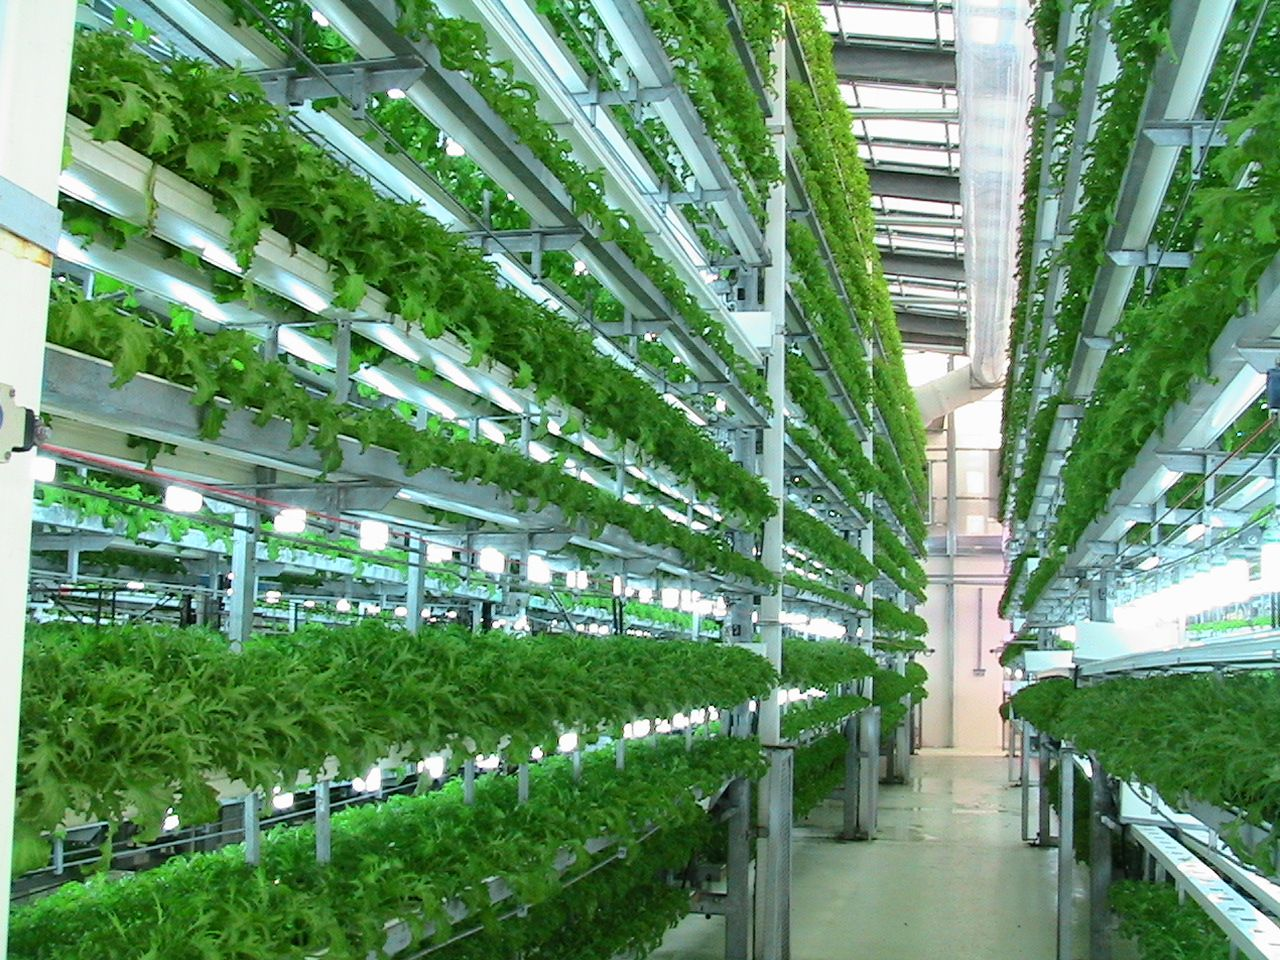 martian food tech hits earth in trillion dollar opportunity